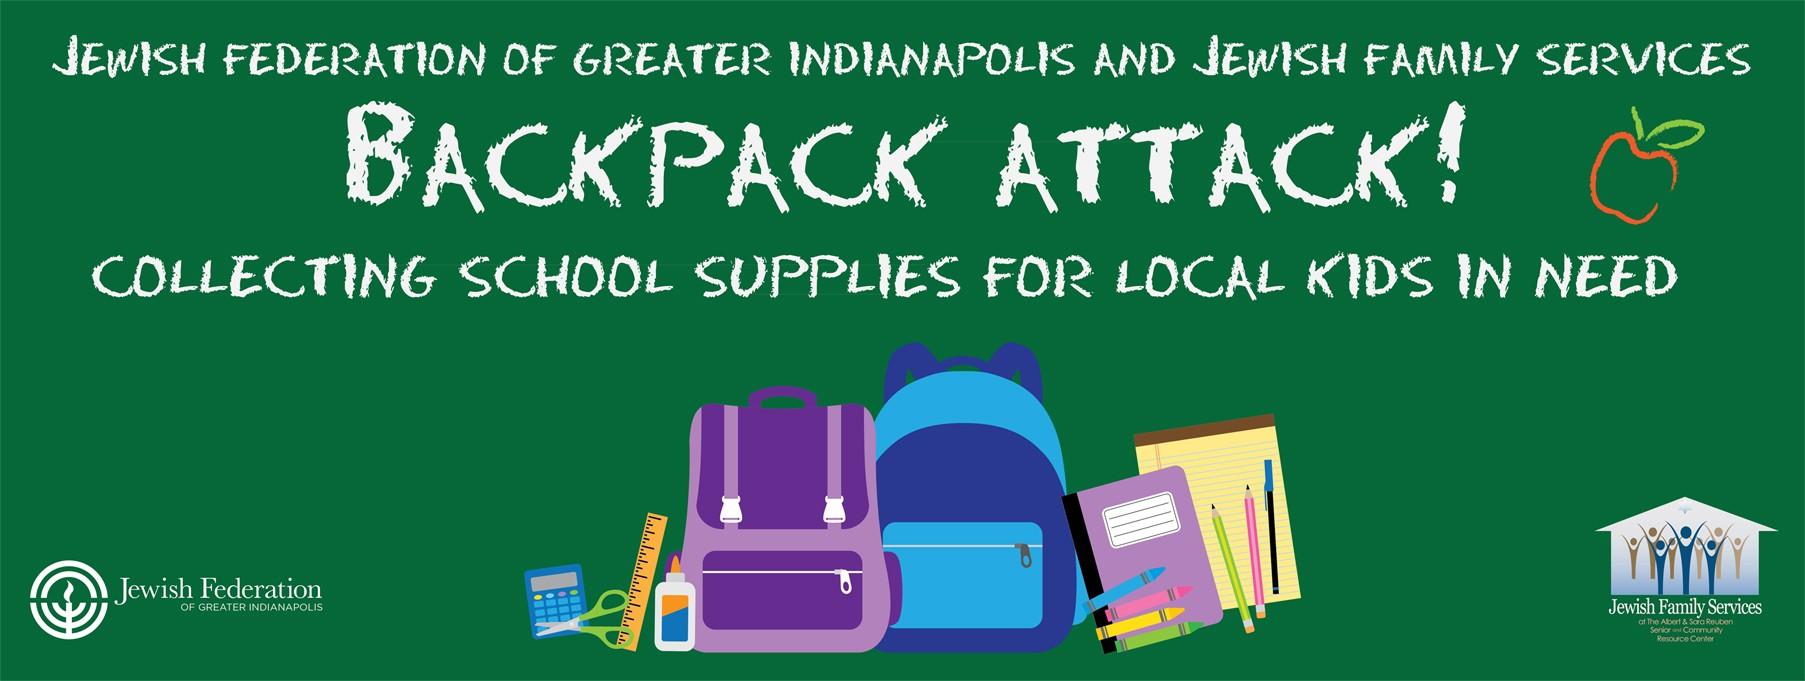 backpack attack 16 banner.jpg